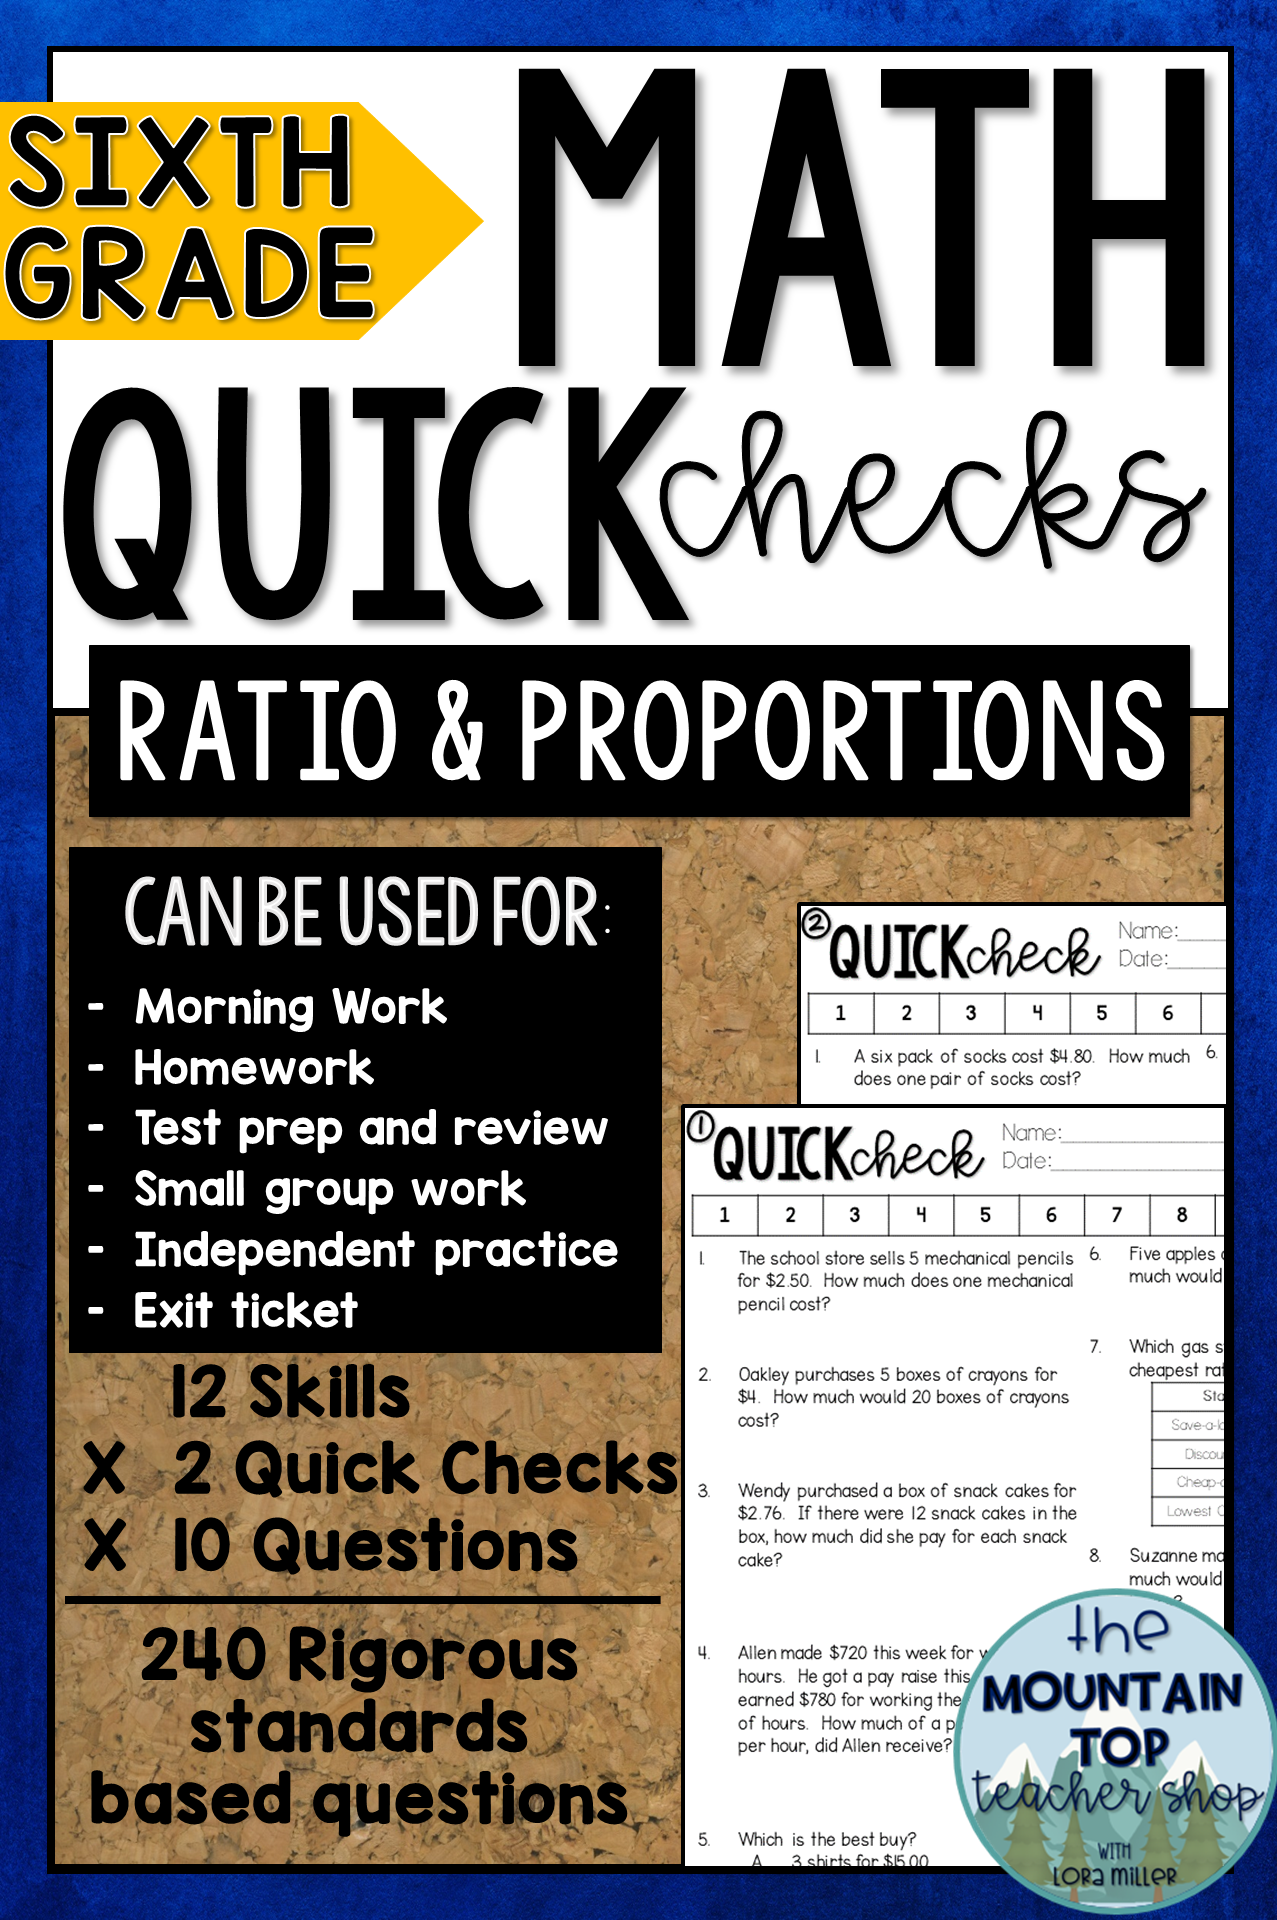 6th Grade Math Quick Checks Ratios And Proportions All Rp Standards Ratios And Proportions Math Math Review [ 1920 x 1277 Pixel ]